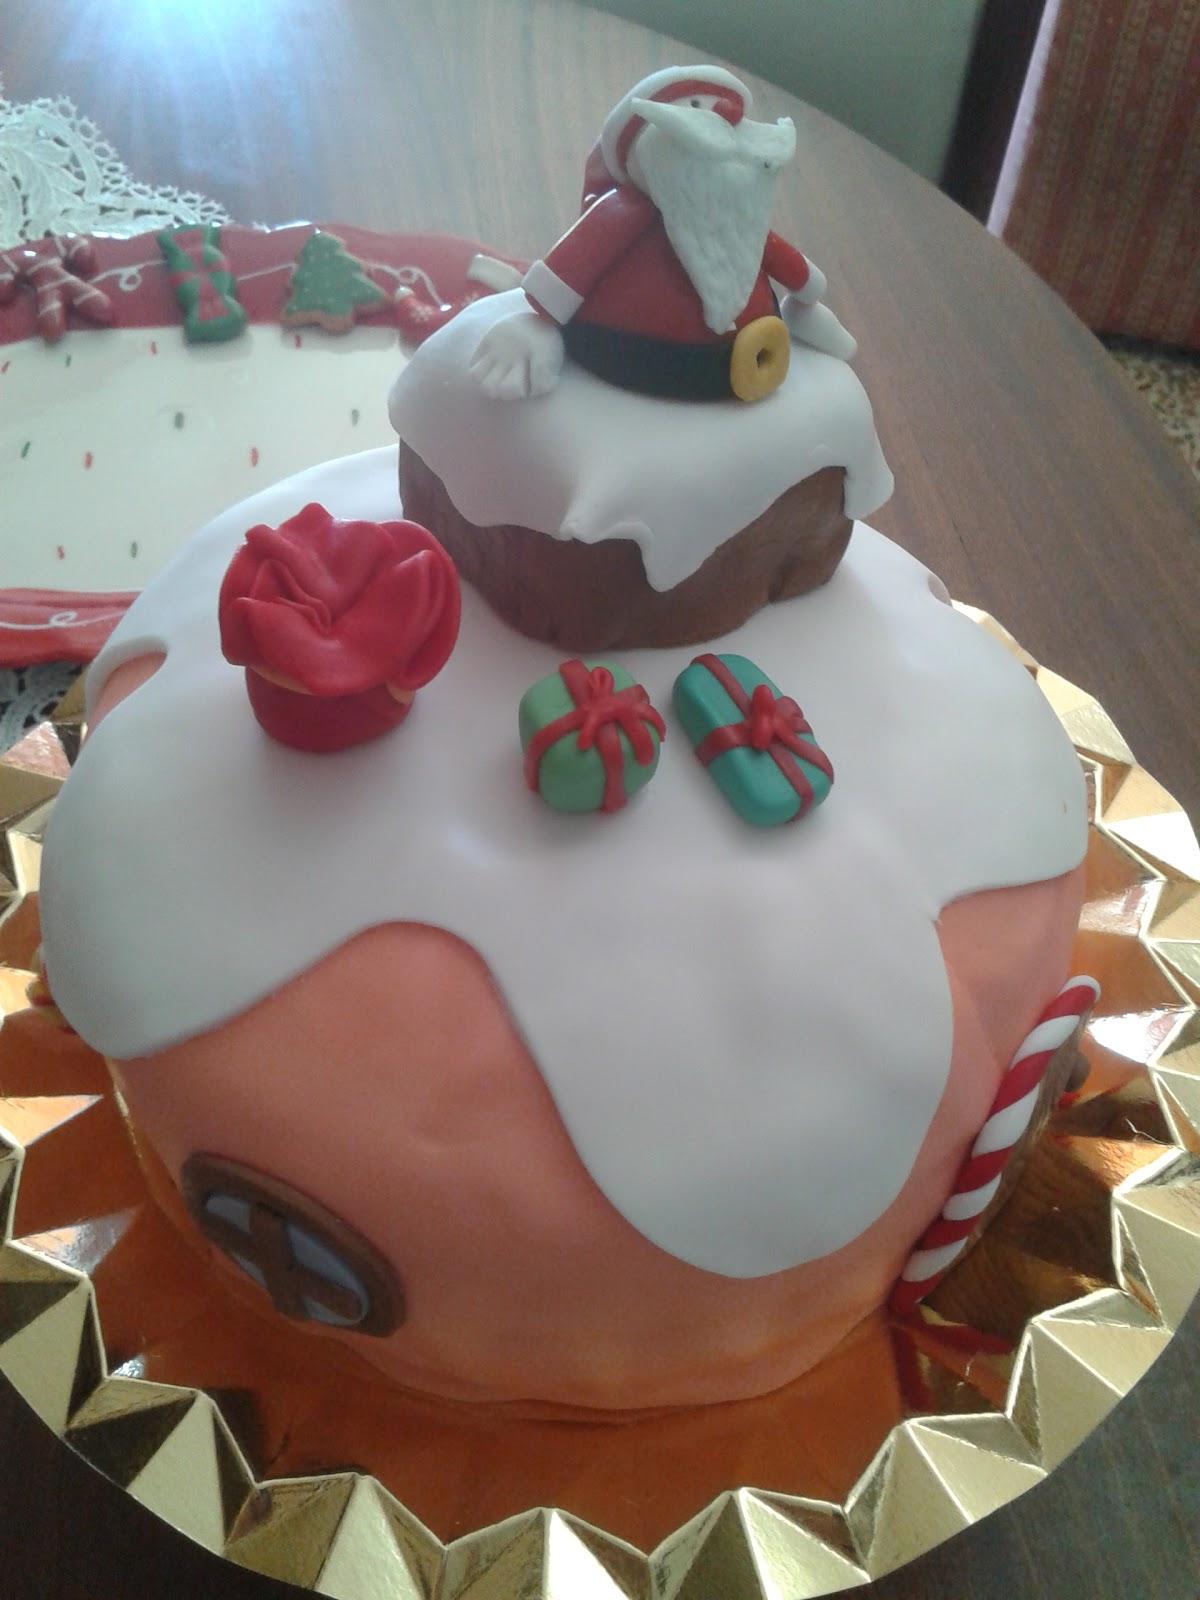 Cupcakes tenerife pap noel en la chimenea - Cupcakes tenerife ...